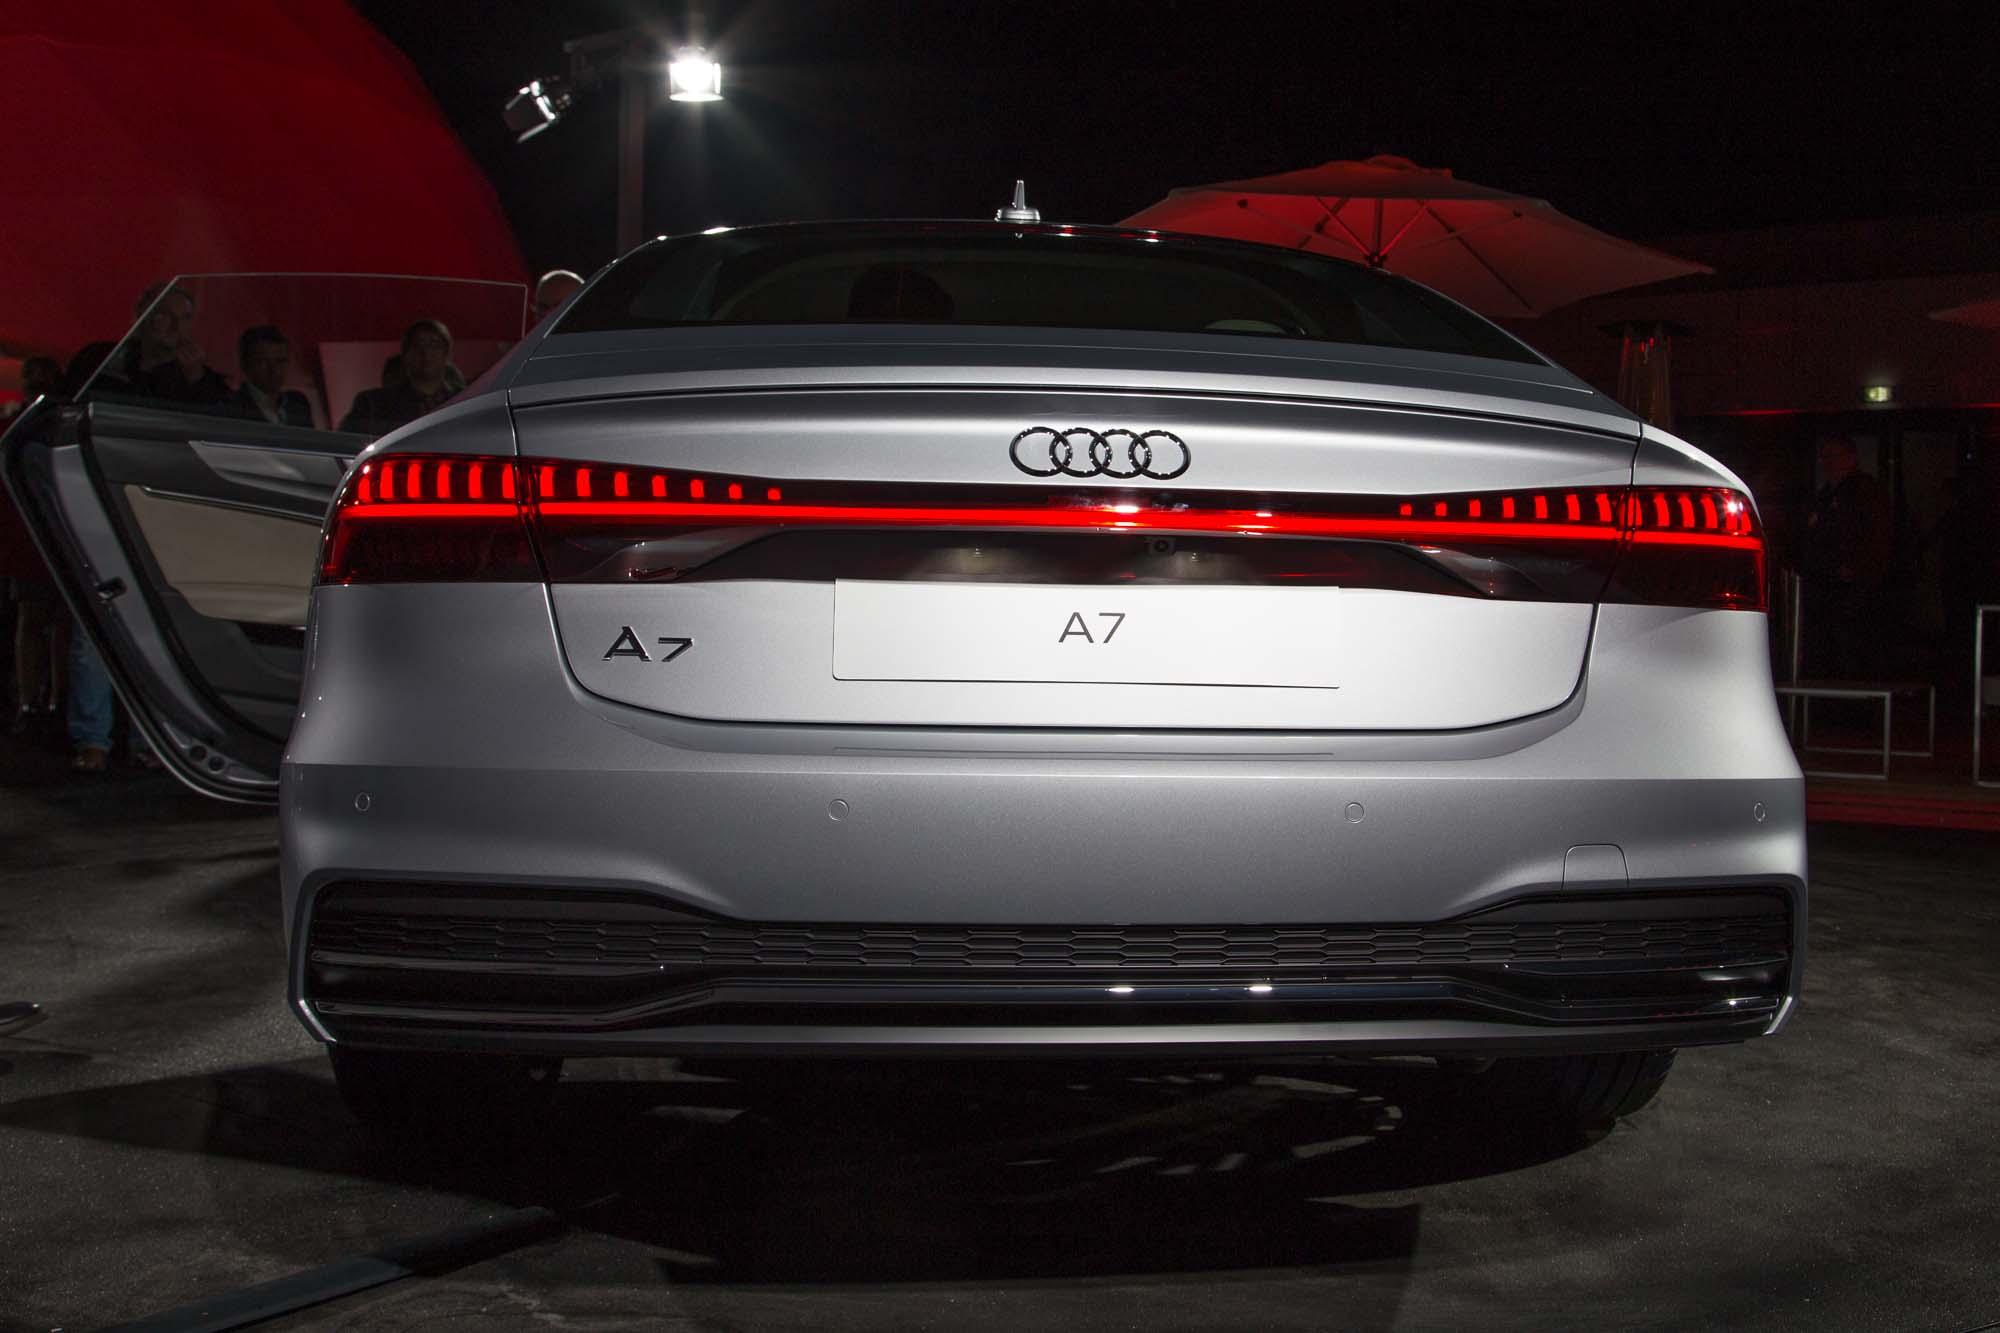 Audi A7 2018 Price >> 2018 Audi A7 Sportback revealed - Photos